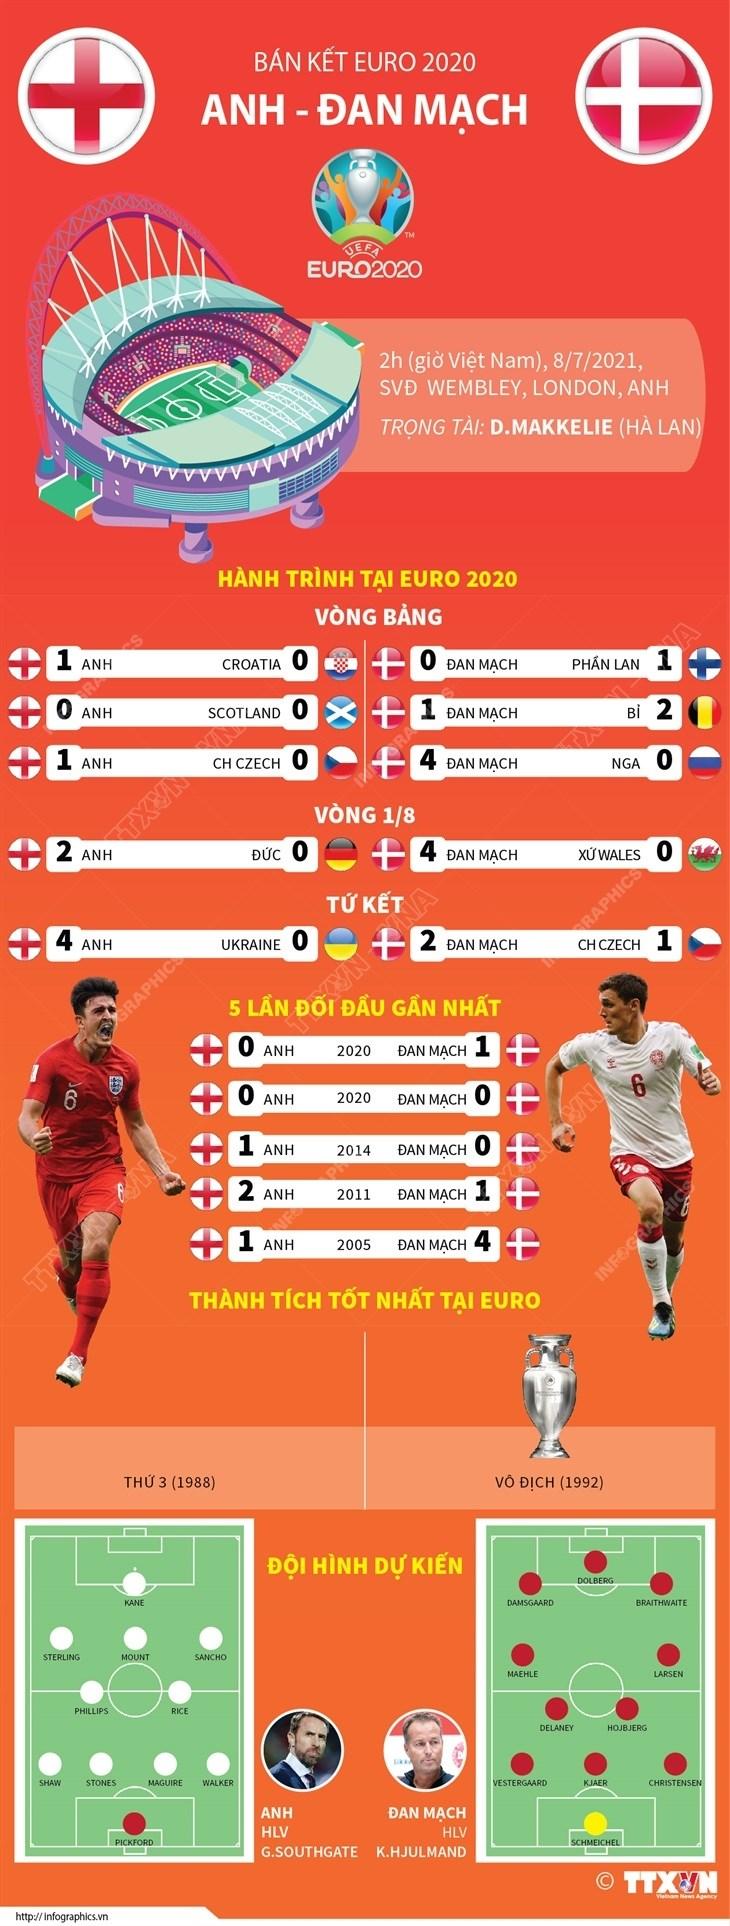 [Infographics] So sanh suc manh cua 2 doi tuyen Anh va Dan Mach hinh anh 1